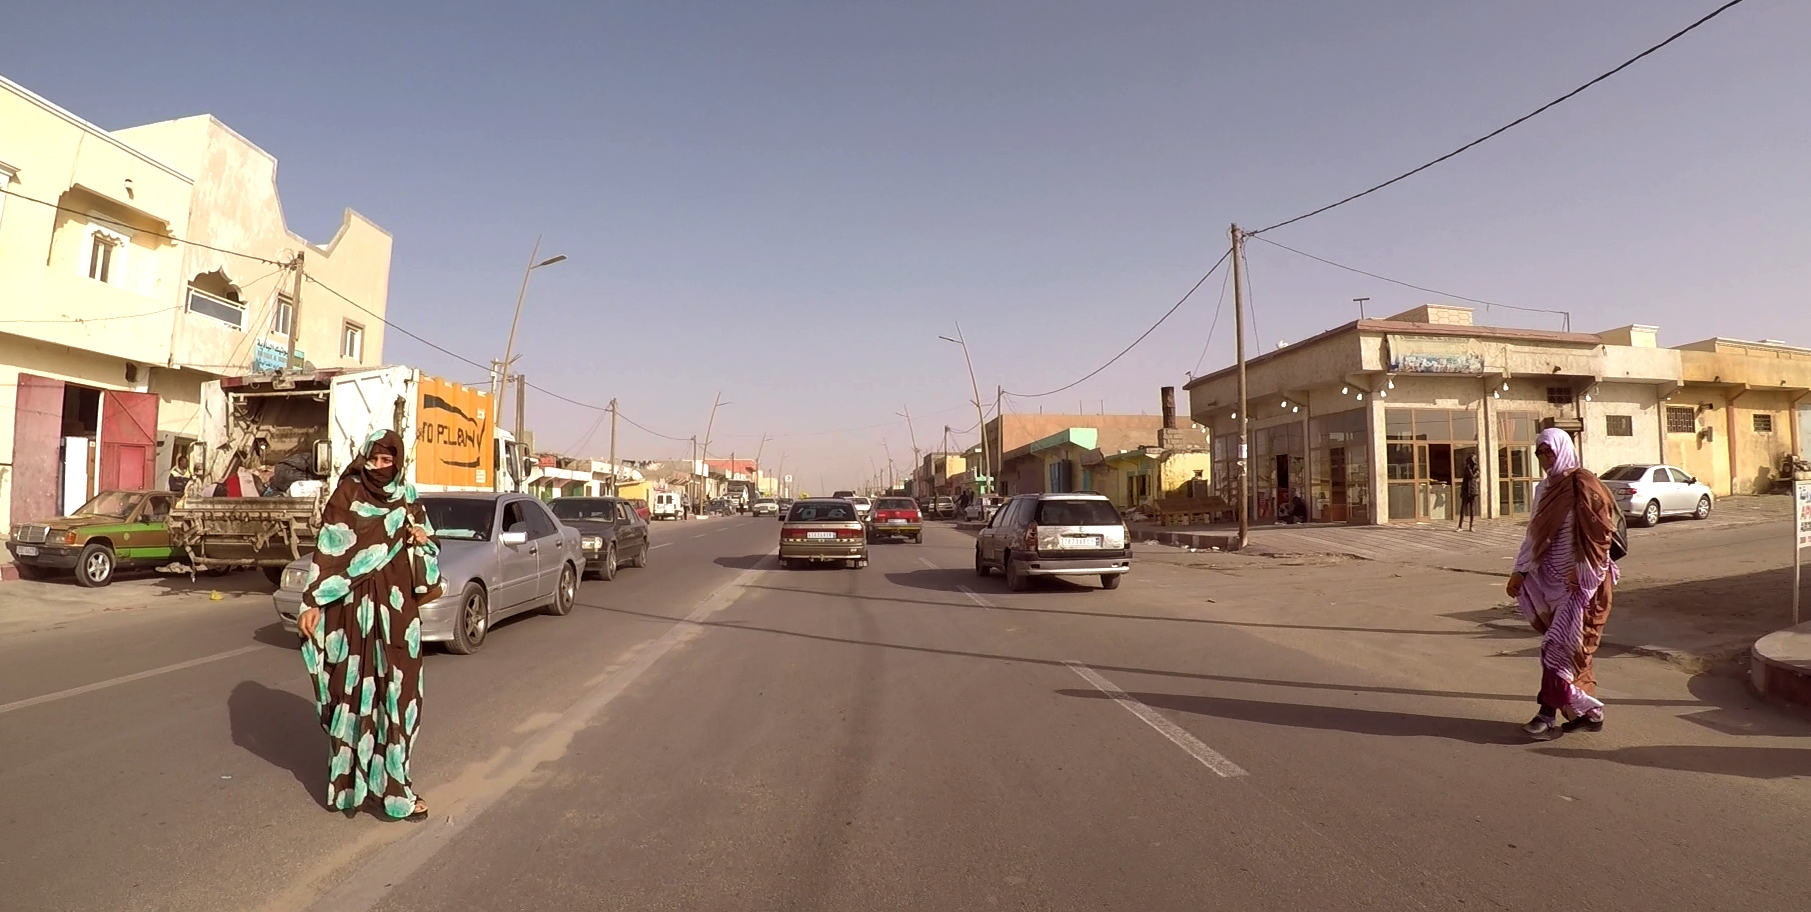 nouadhibou calle mauritania pablocaminante - Mauritania 1/5, Nouadhibou